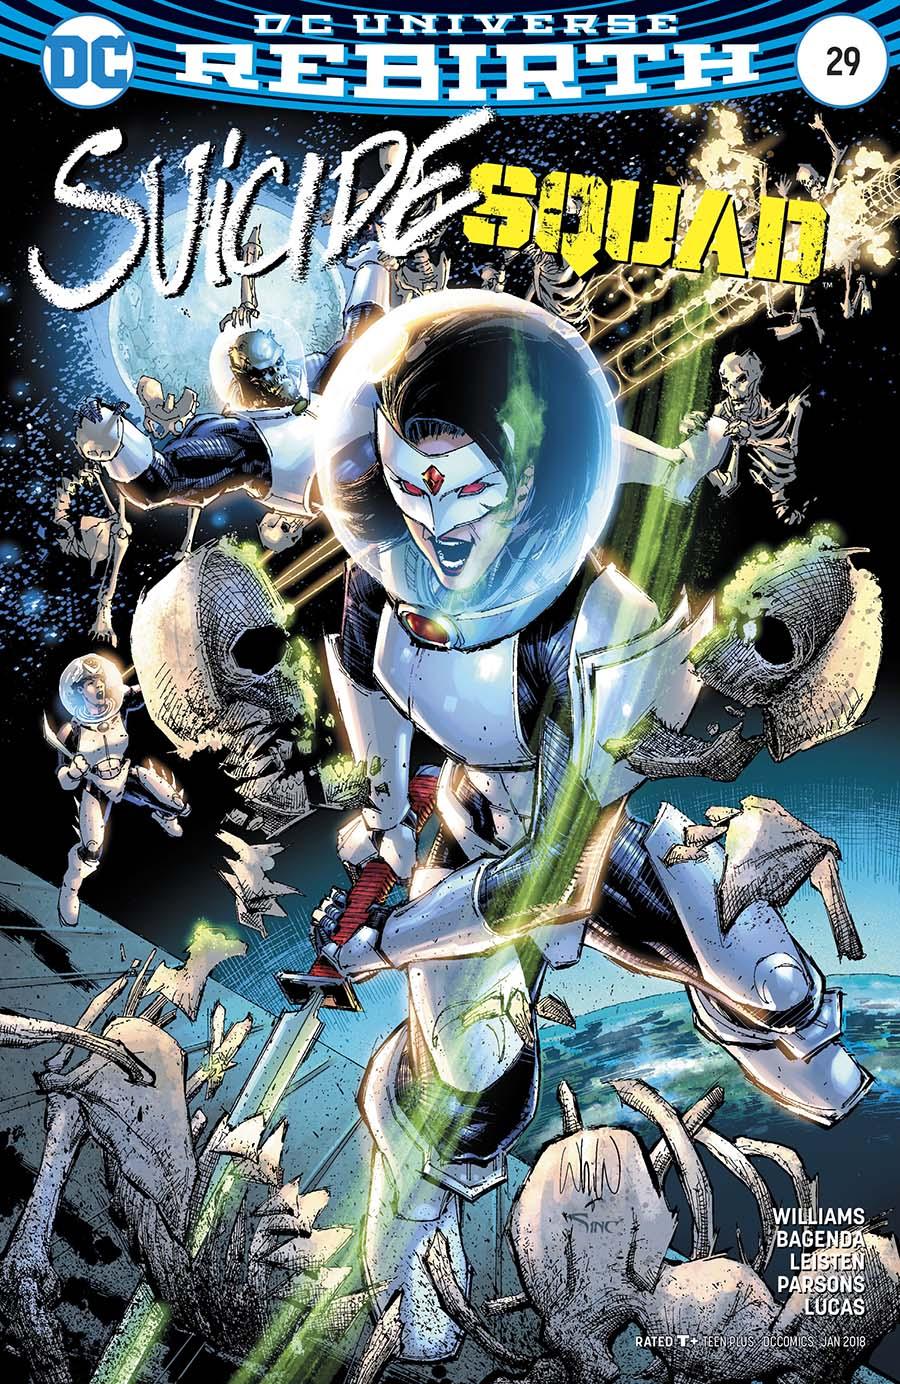 Suicide Squad Vol 4 #29 Cover B Variant Whilce Portacio Cover